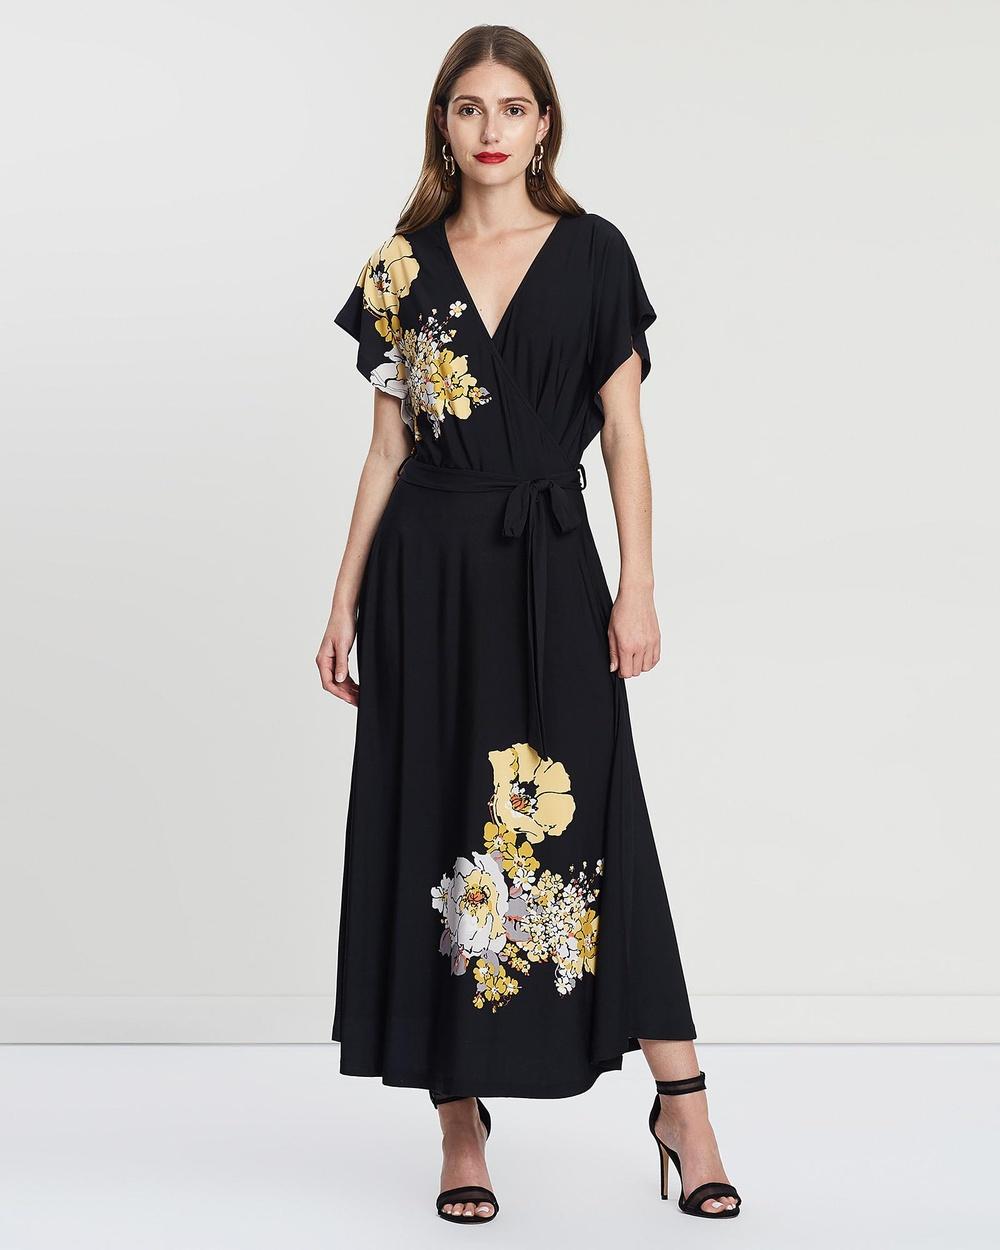 Leona Edmiston Poppy Blooms Gabbie Cocktail Dress